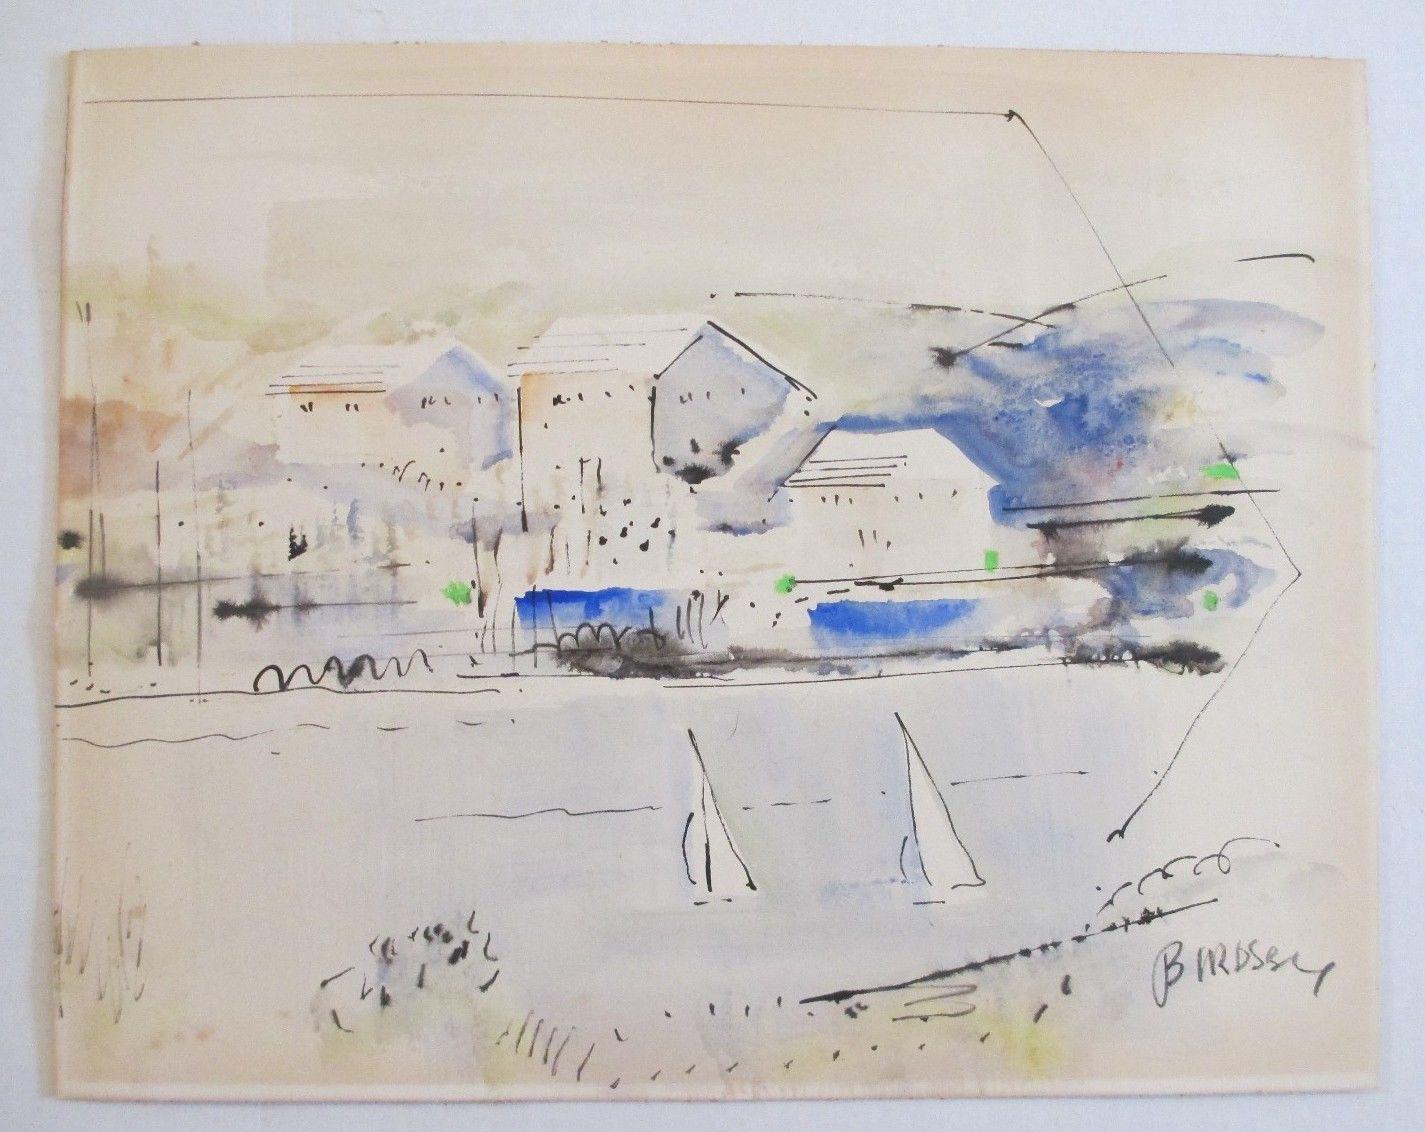 Alfred Birdsey Bermuda Vintage Coastal Impressionism Nautical